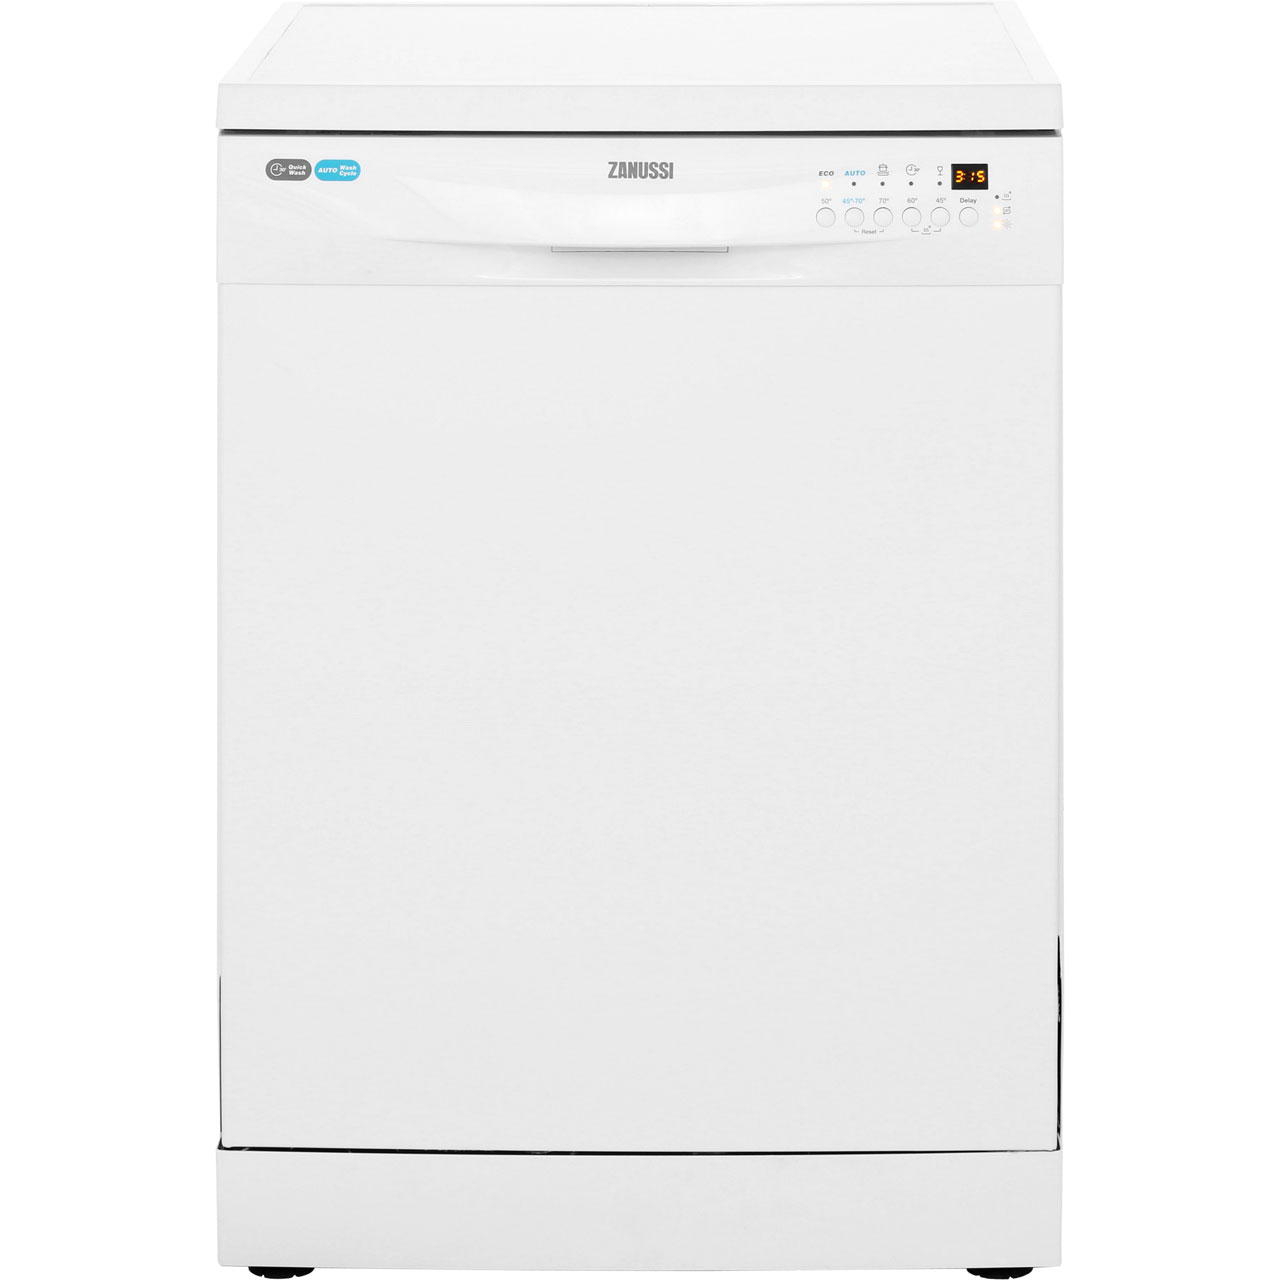 Zanussi Avanti ZDF26003WA Free Standing Dishwasher in White